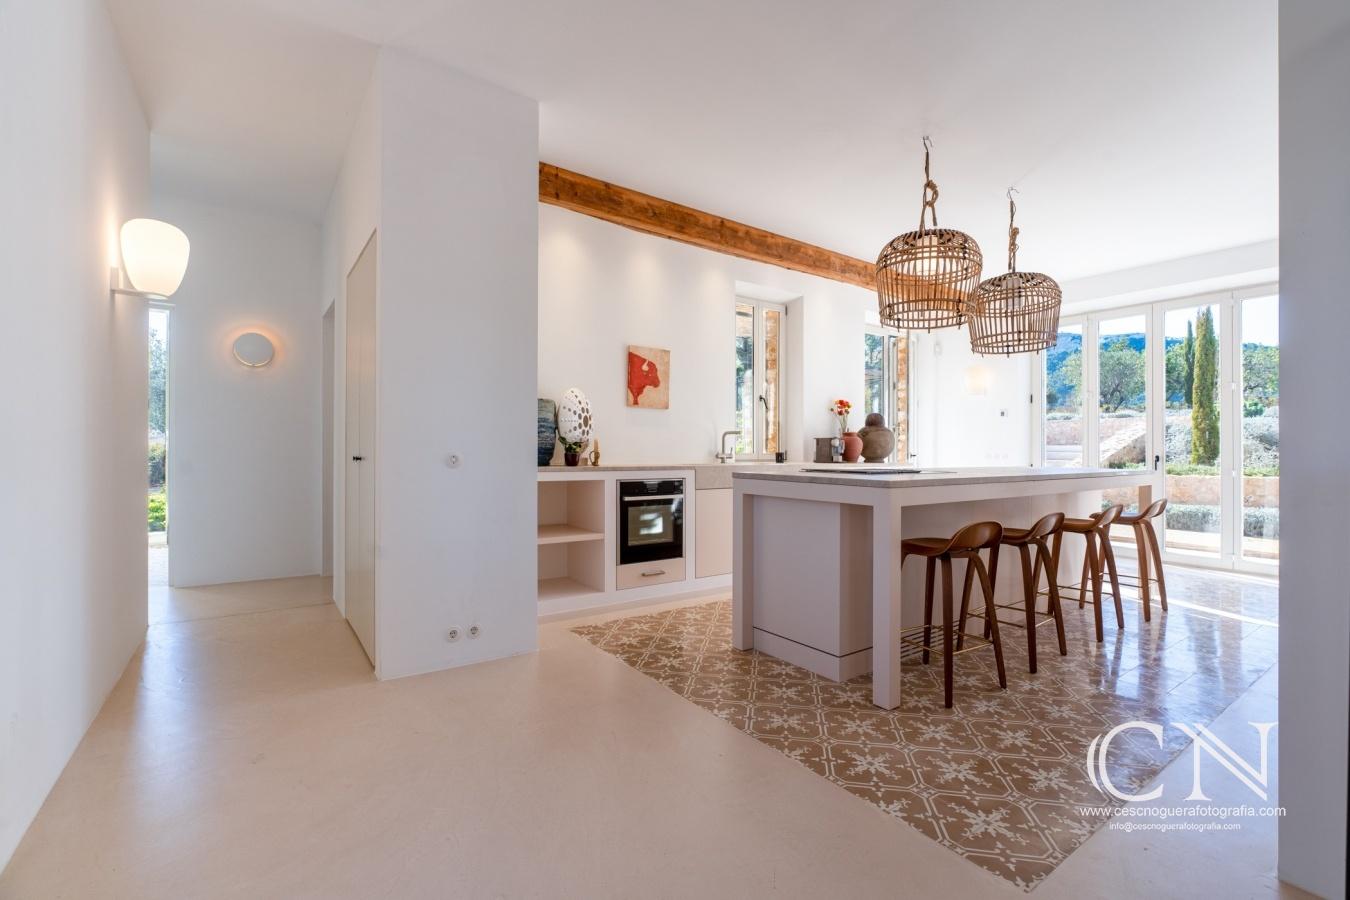 Real Estate  - Cesc Noguera Fotografia,  Architectural & Interior design photographer / Landscape Photography.